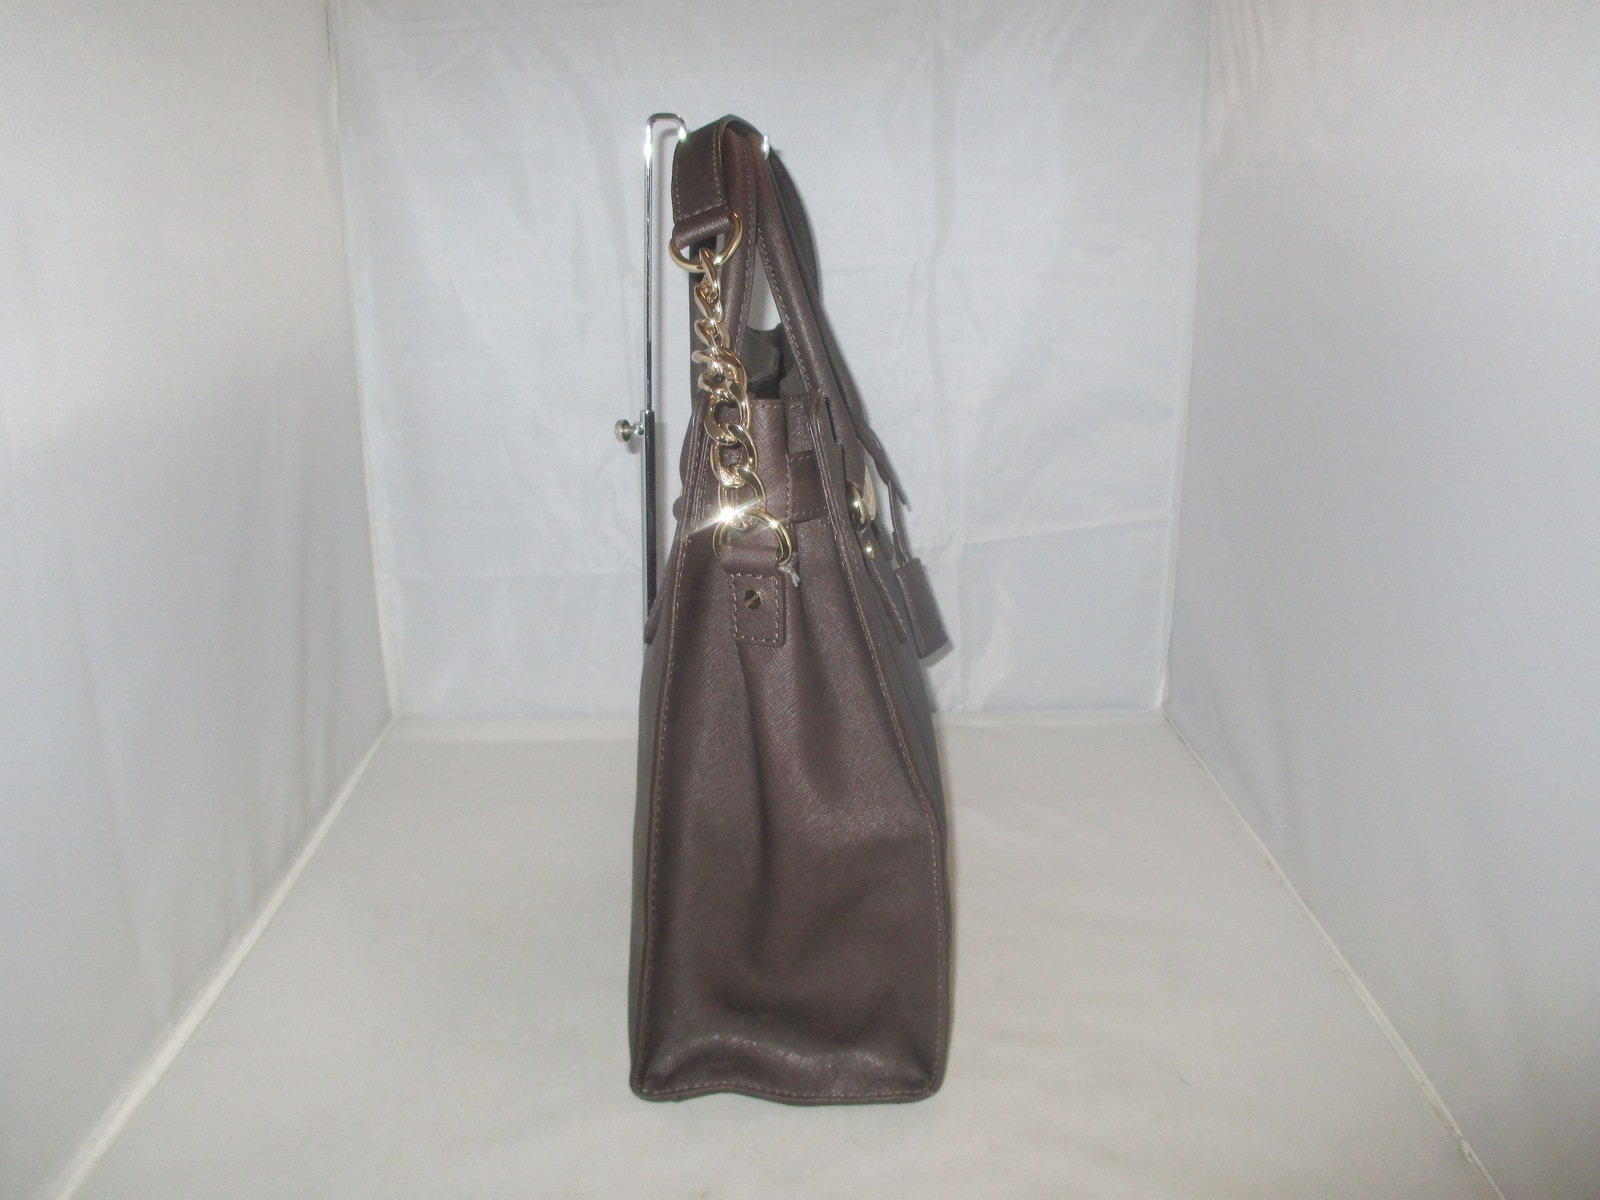 b9f1fdc9ff79 Michael Kors Handbag